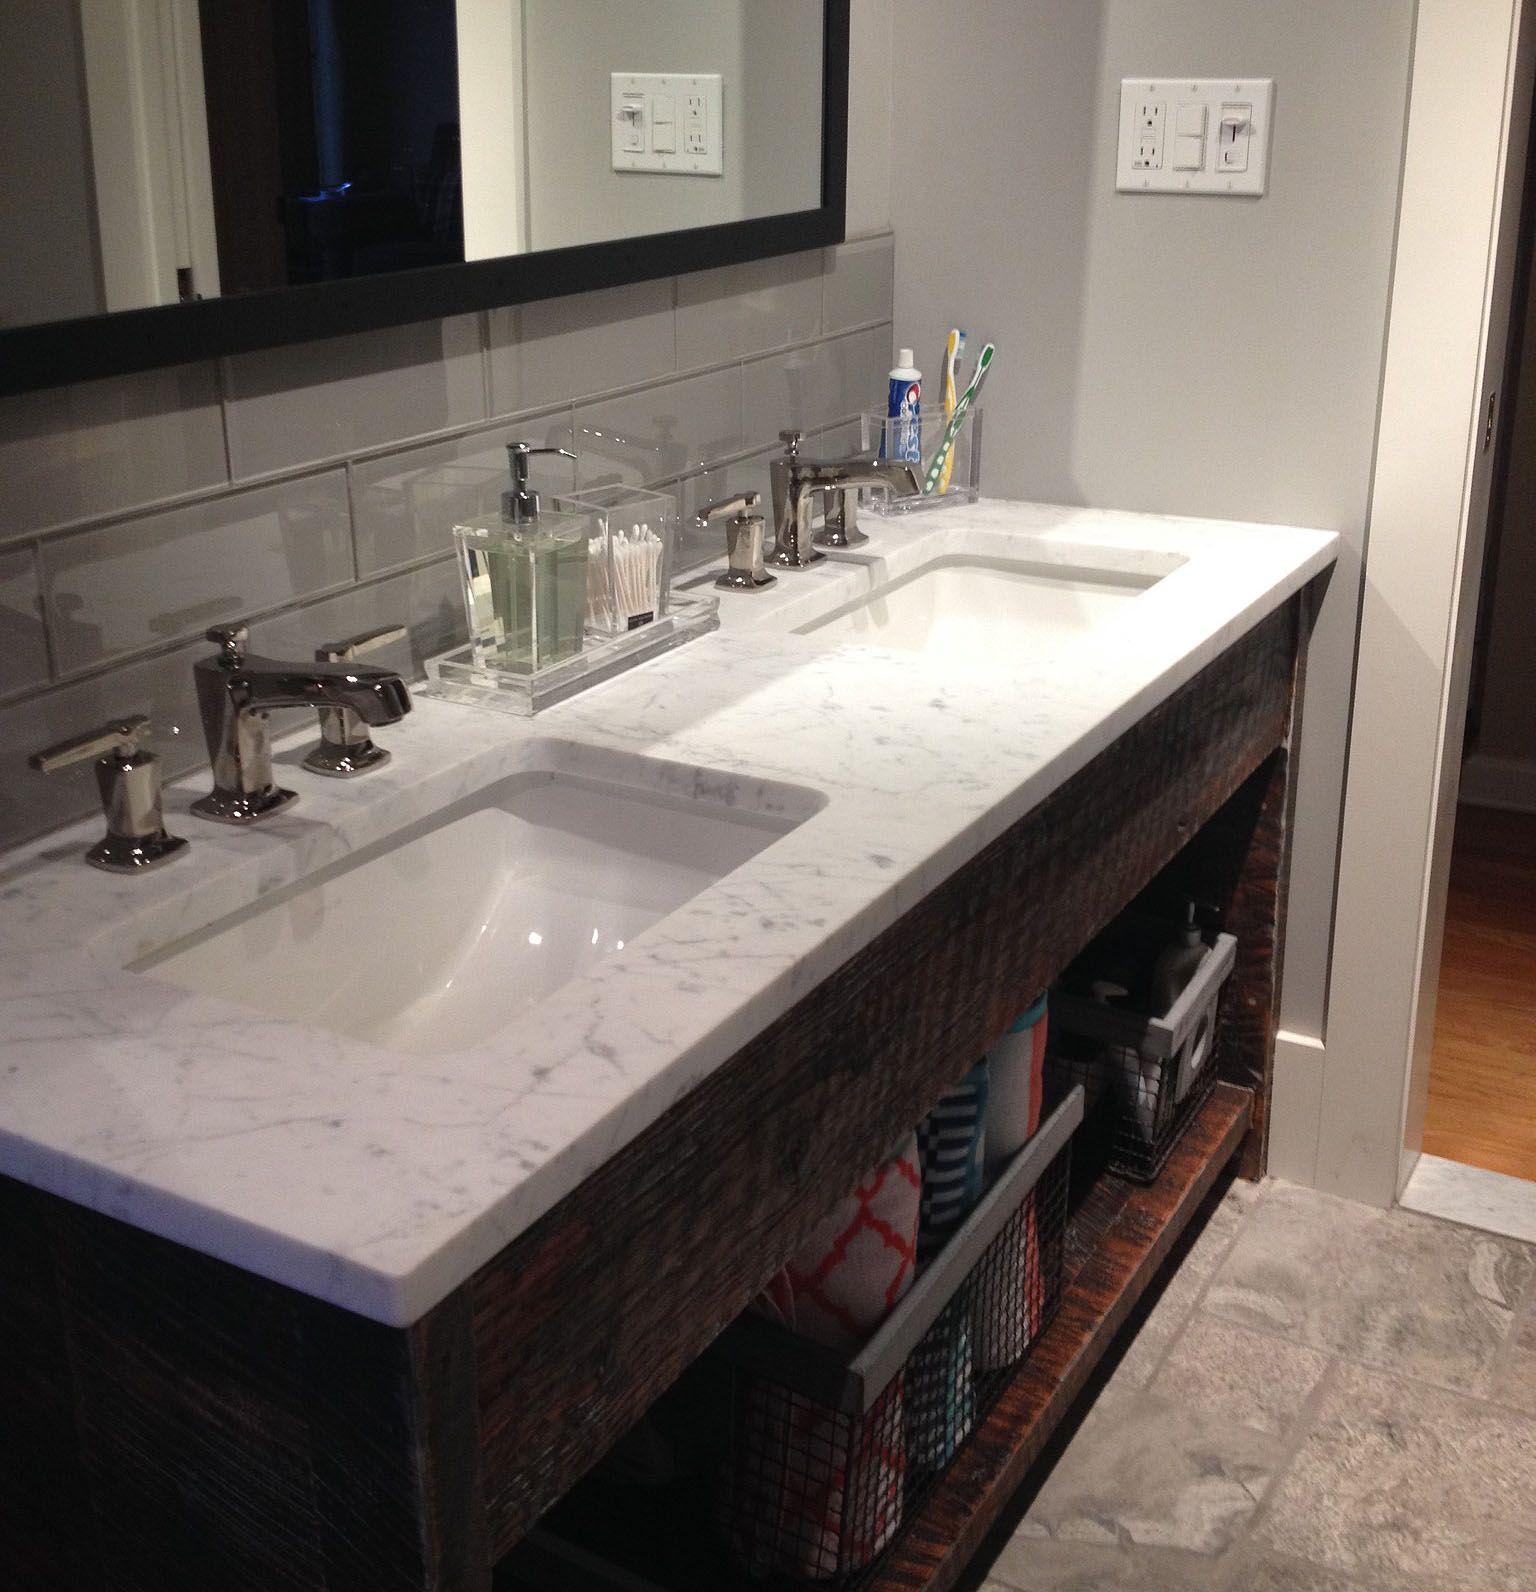 Large smoke 4x12 bathroom sink backsplash Bathroom Pinterest